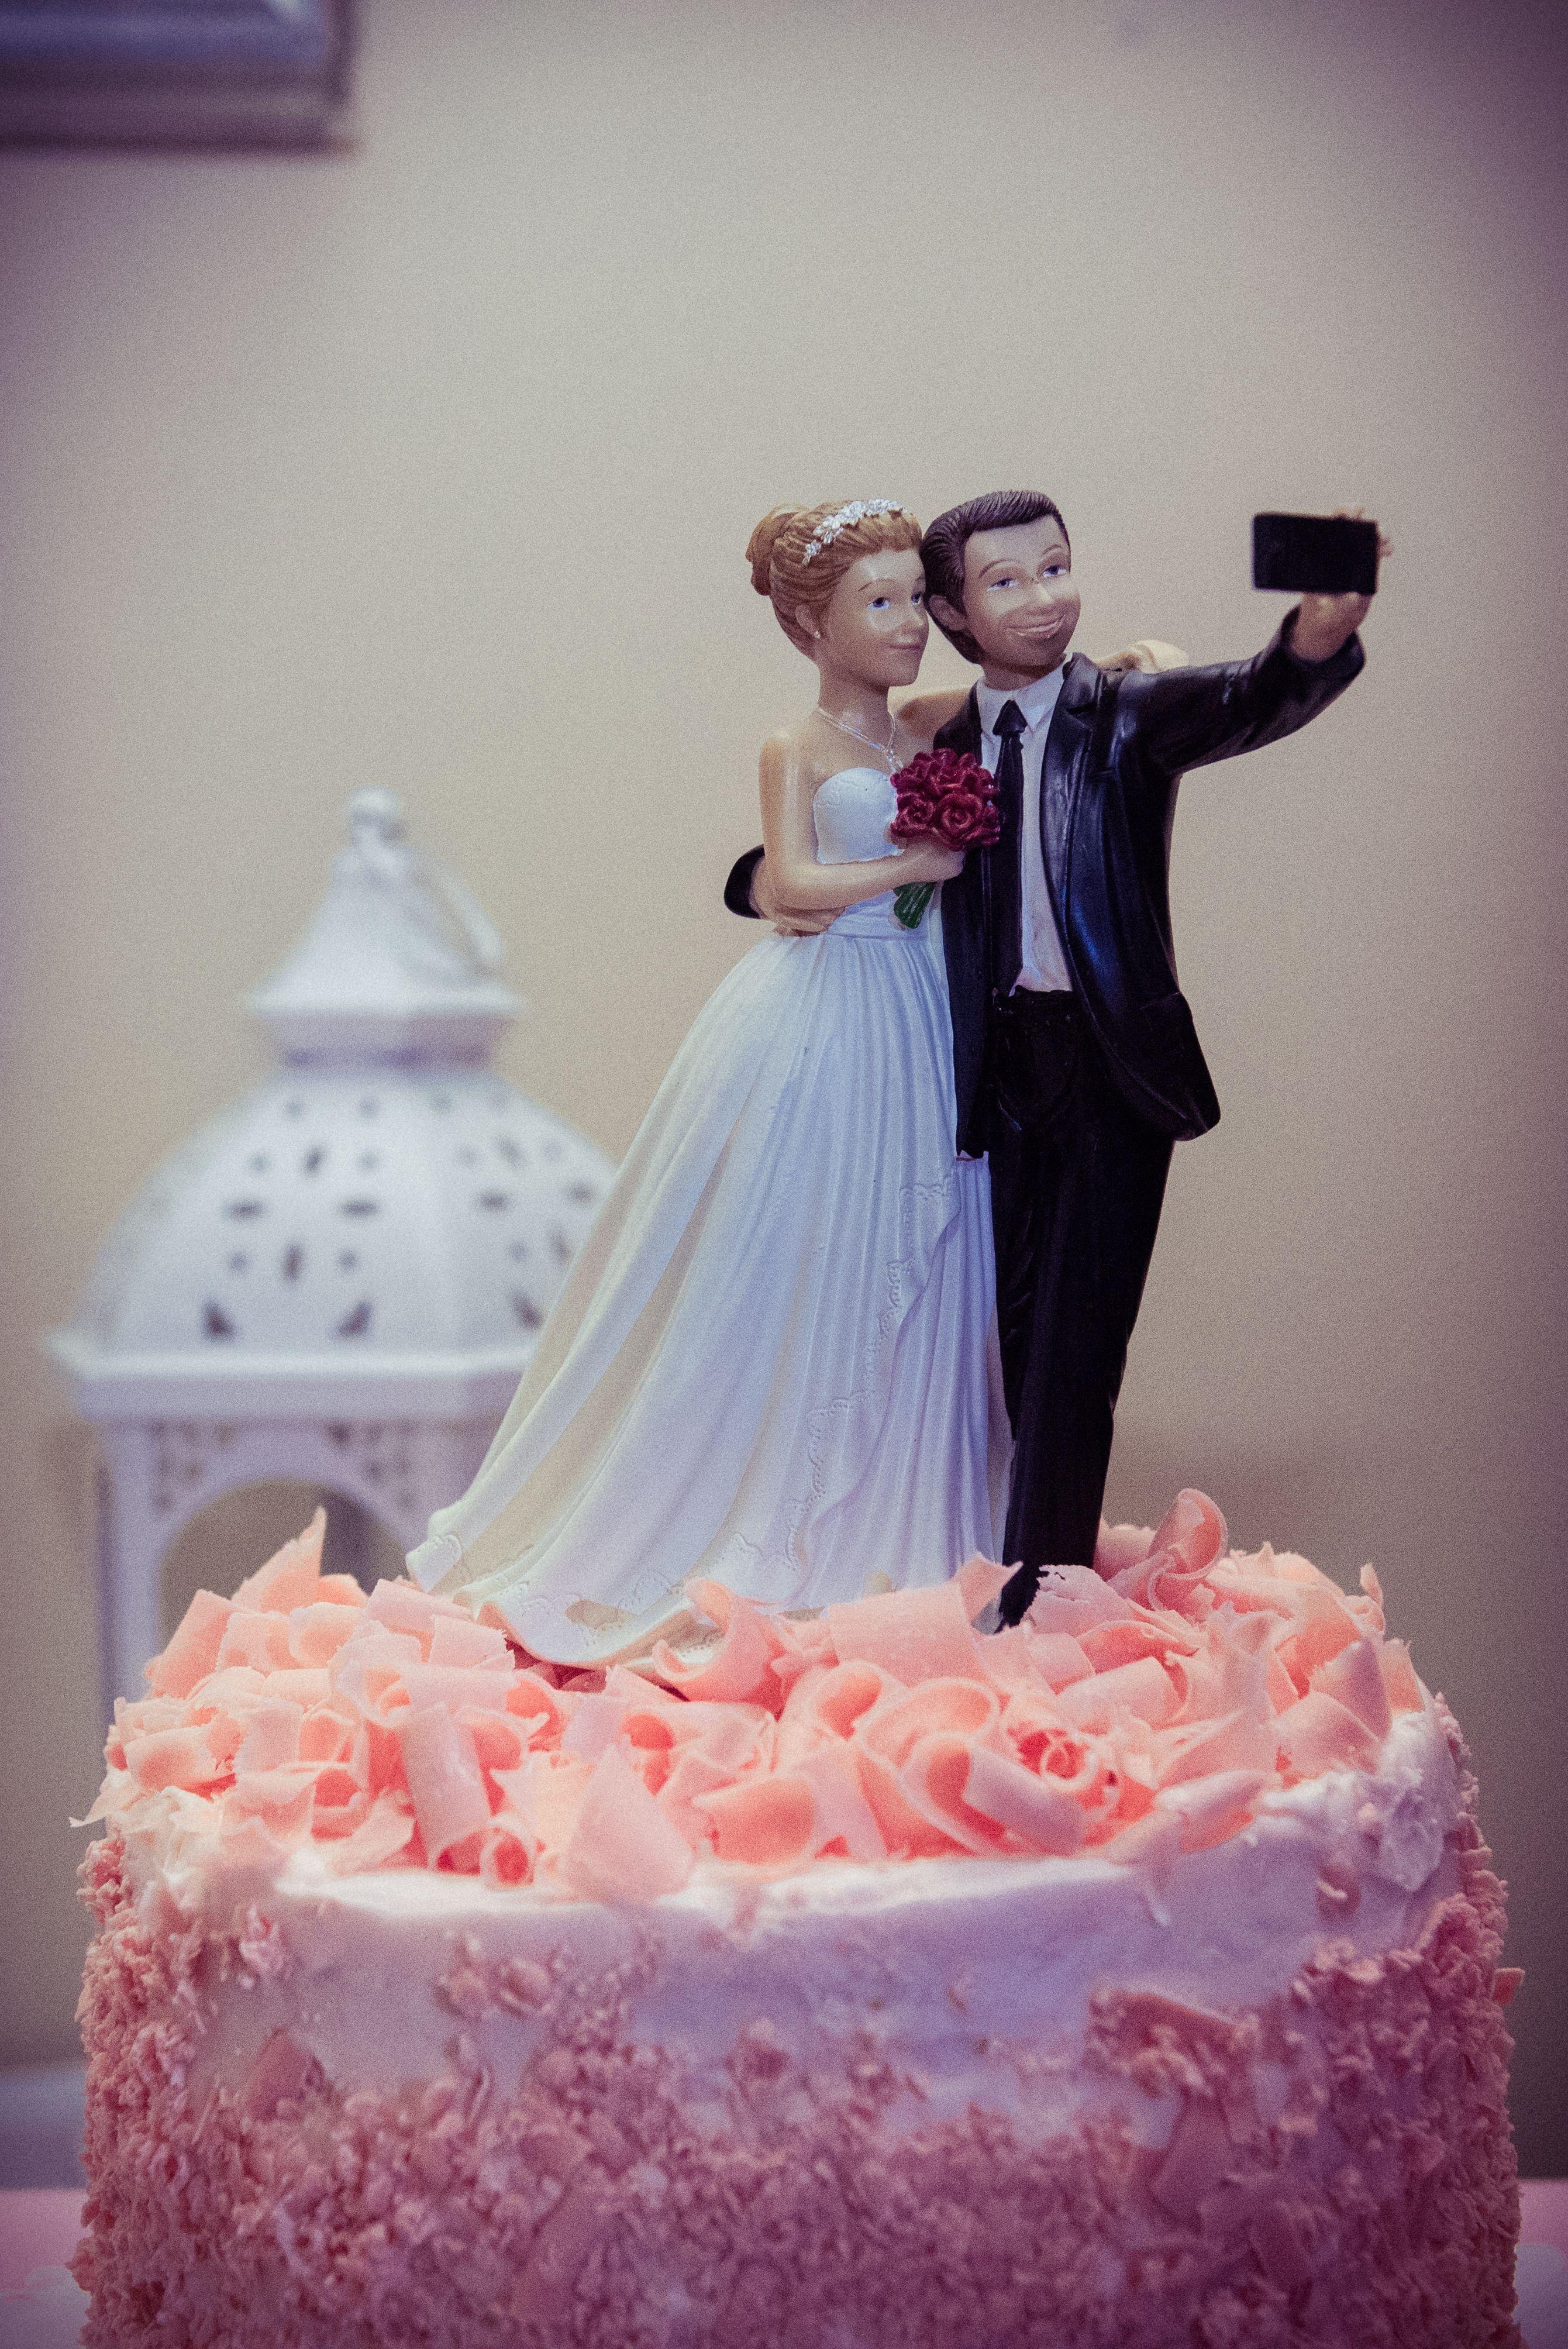 Wedding Ballroom Bride Groom Just Married Wedding Cake